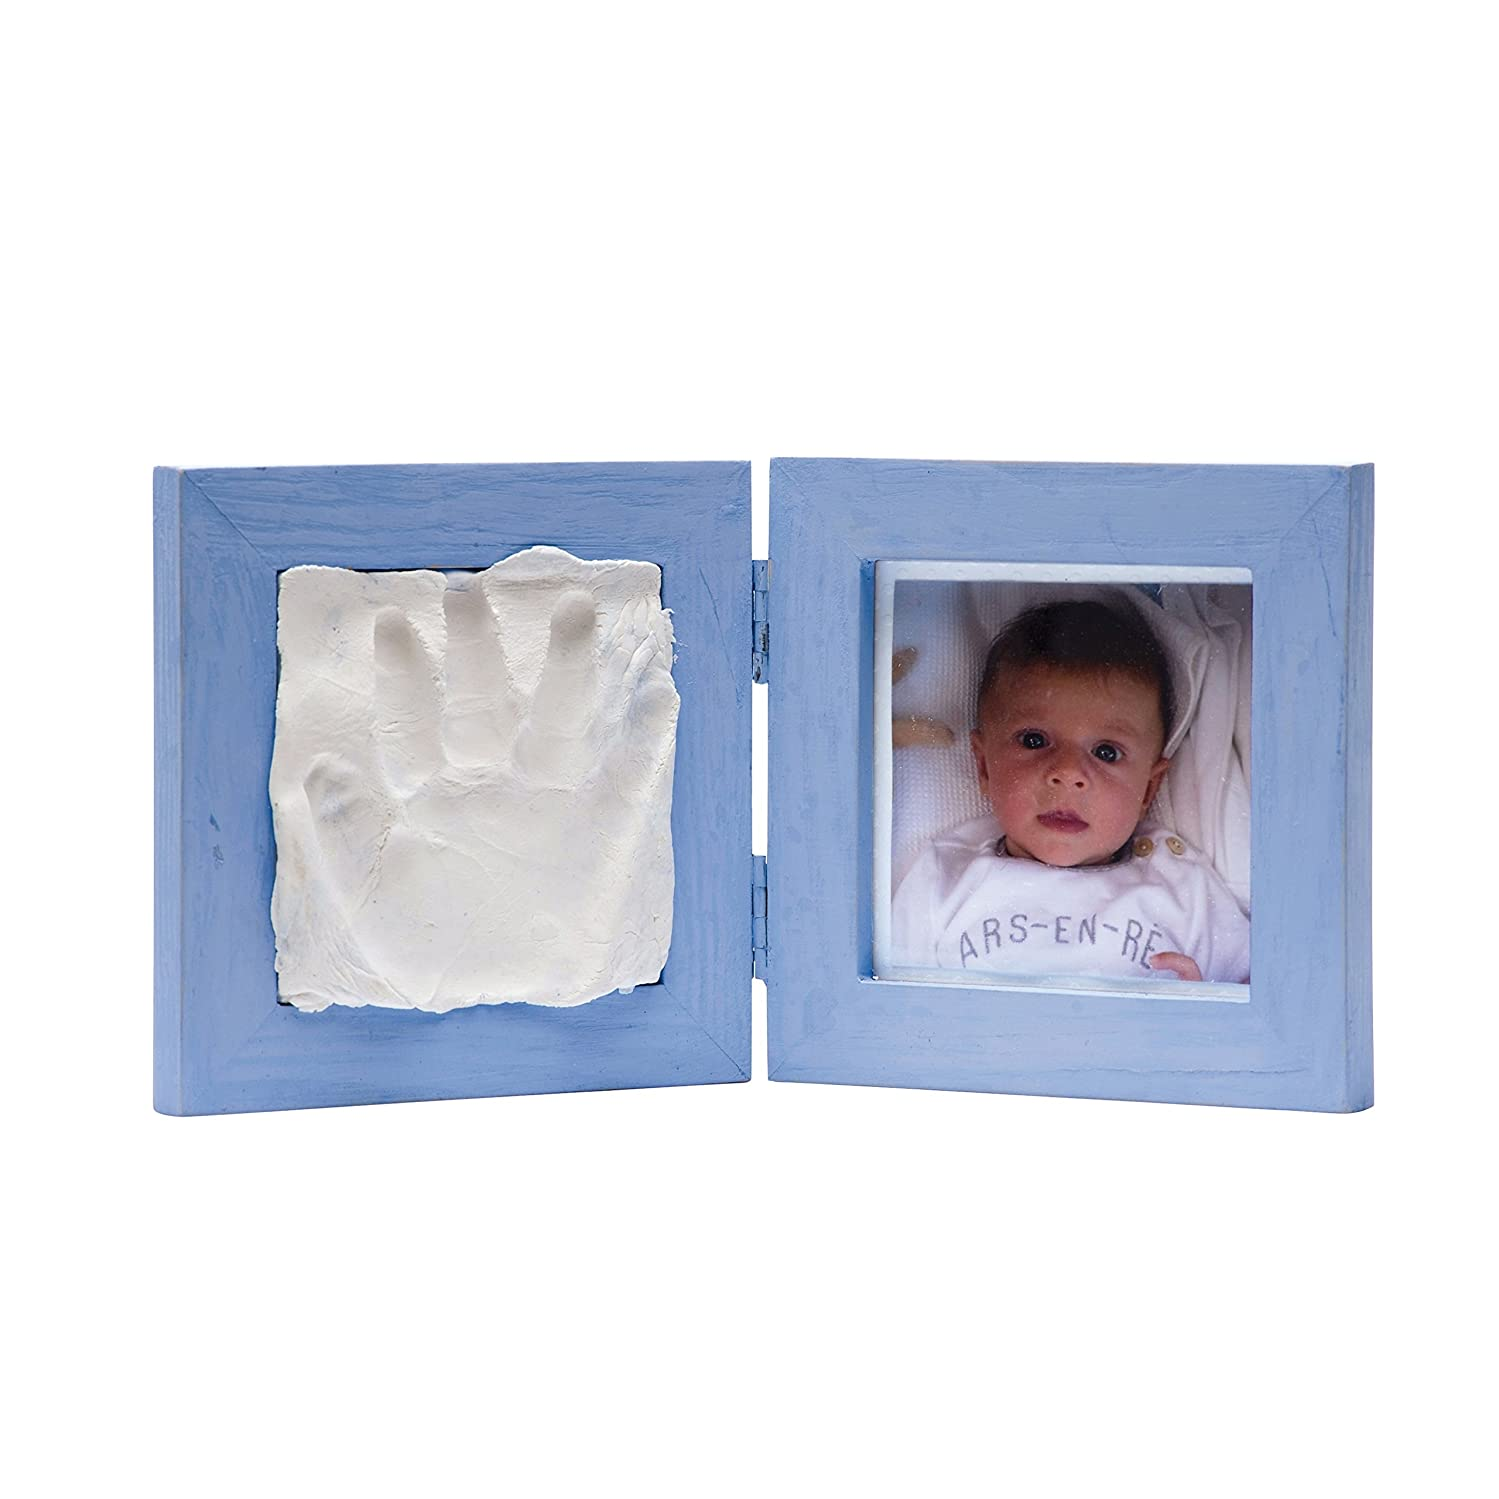 Artemio 13040001 Photo & Imprint Baby Frame, Wooden Frame-12.5cmx 12.5cm x 1.2Cm